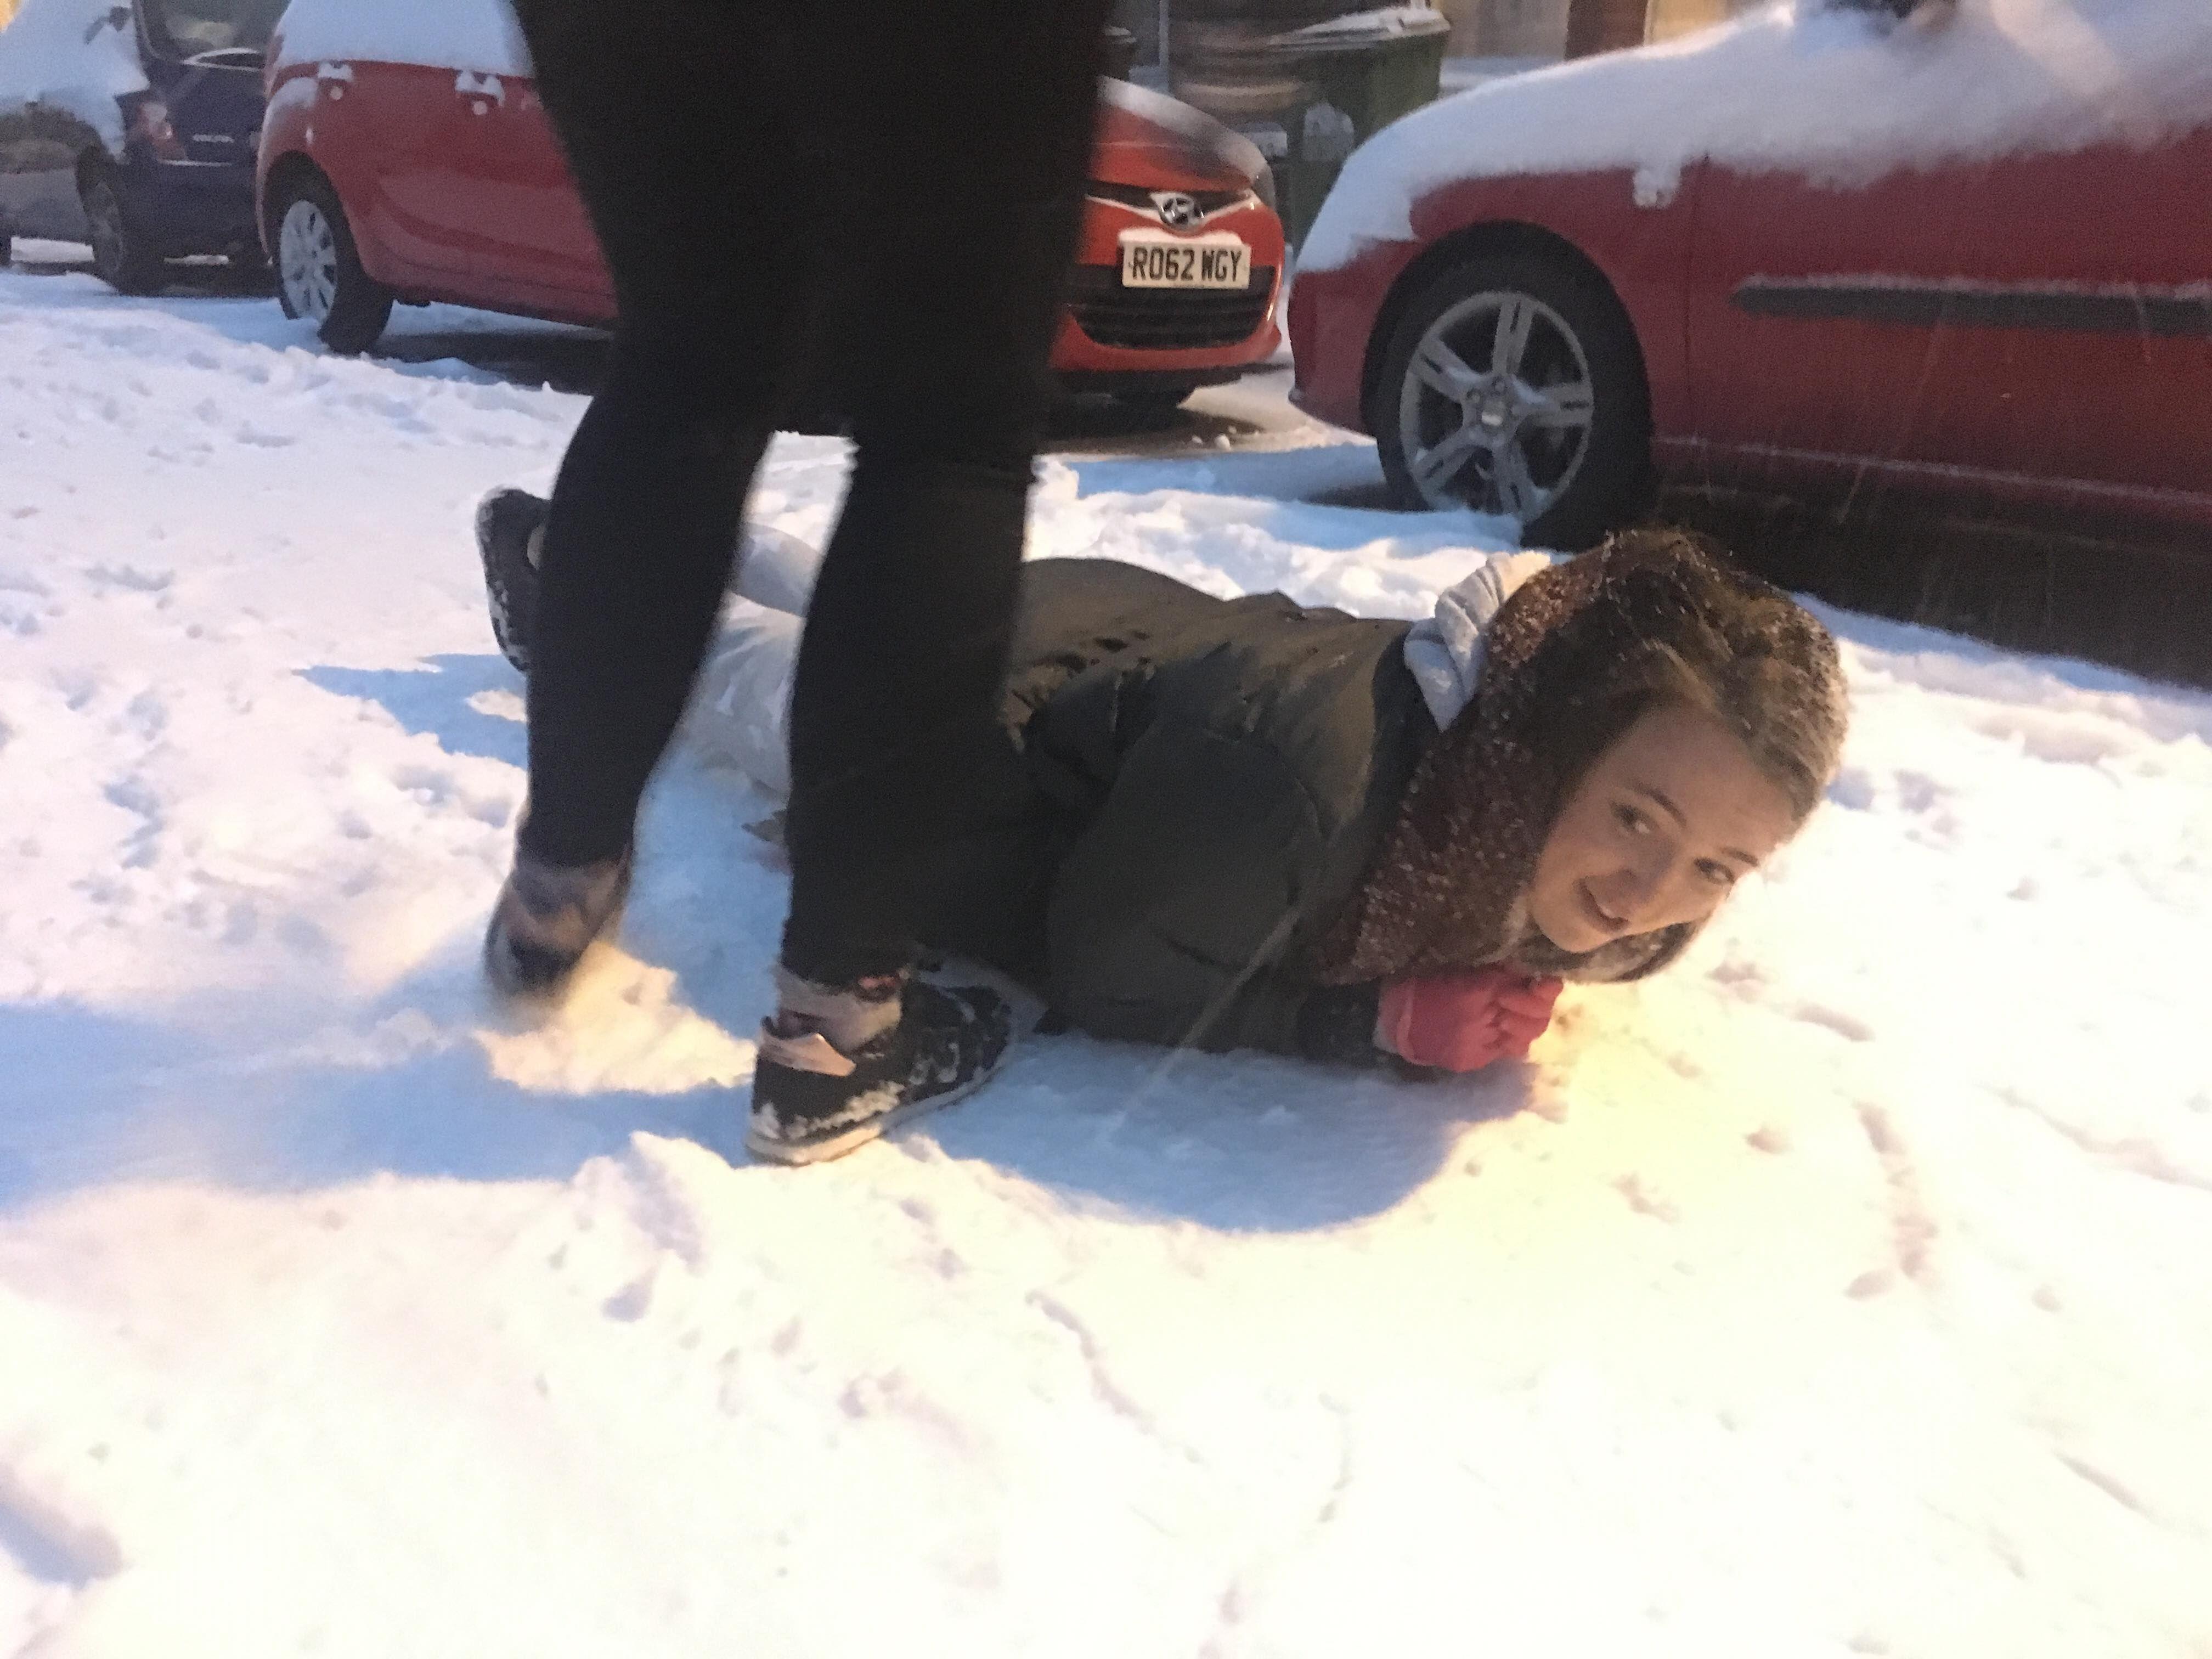 Image may contain: Snow, Outdoors, Helmet, Hardhat, Crash Helmet, Clothing